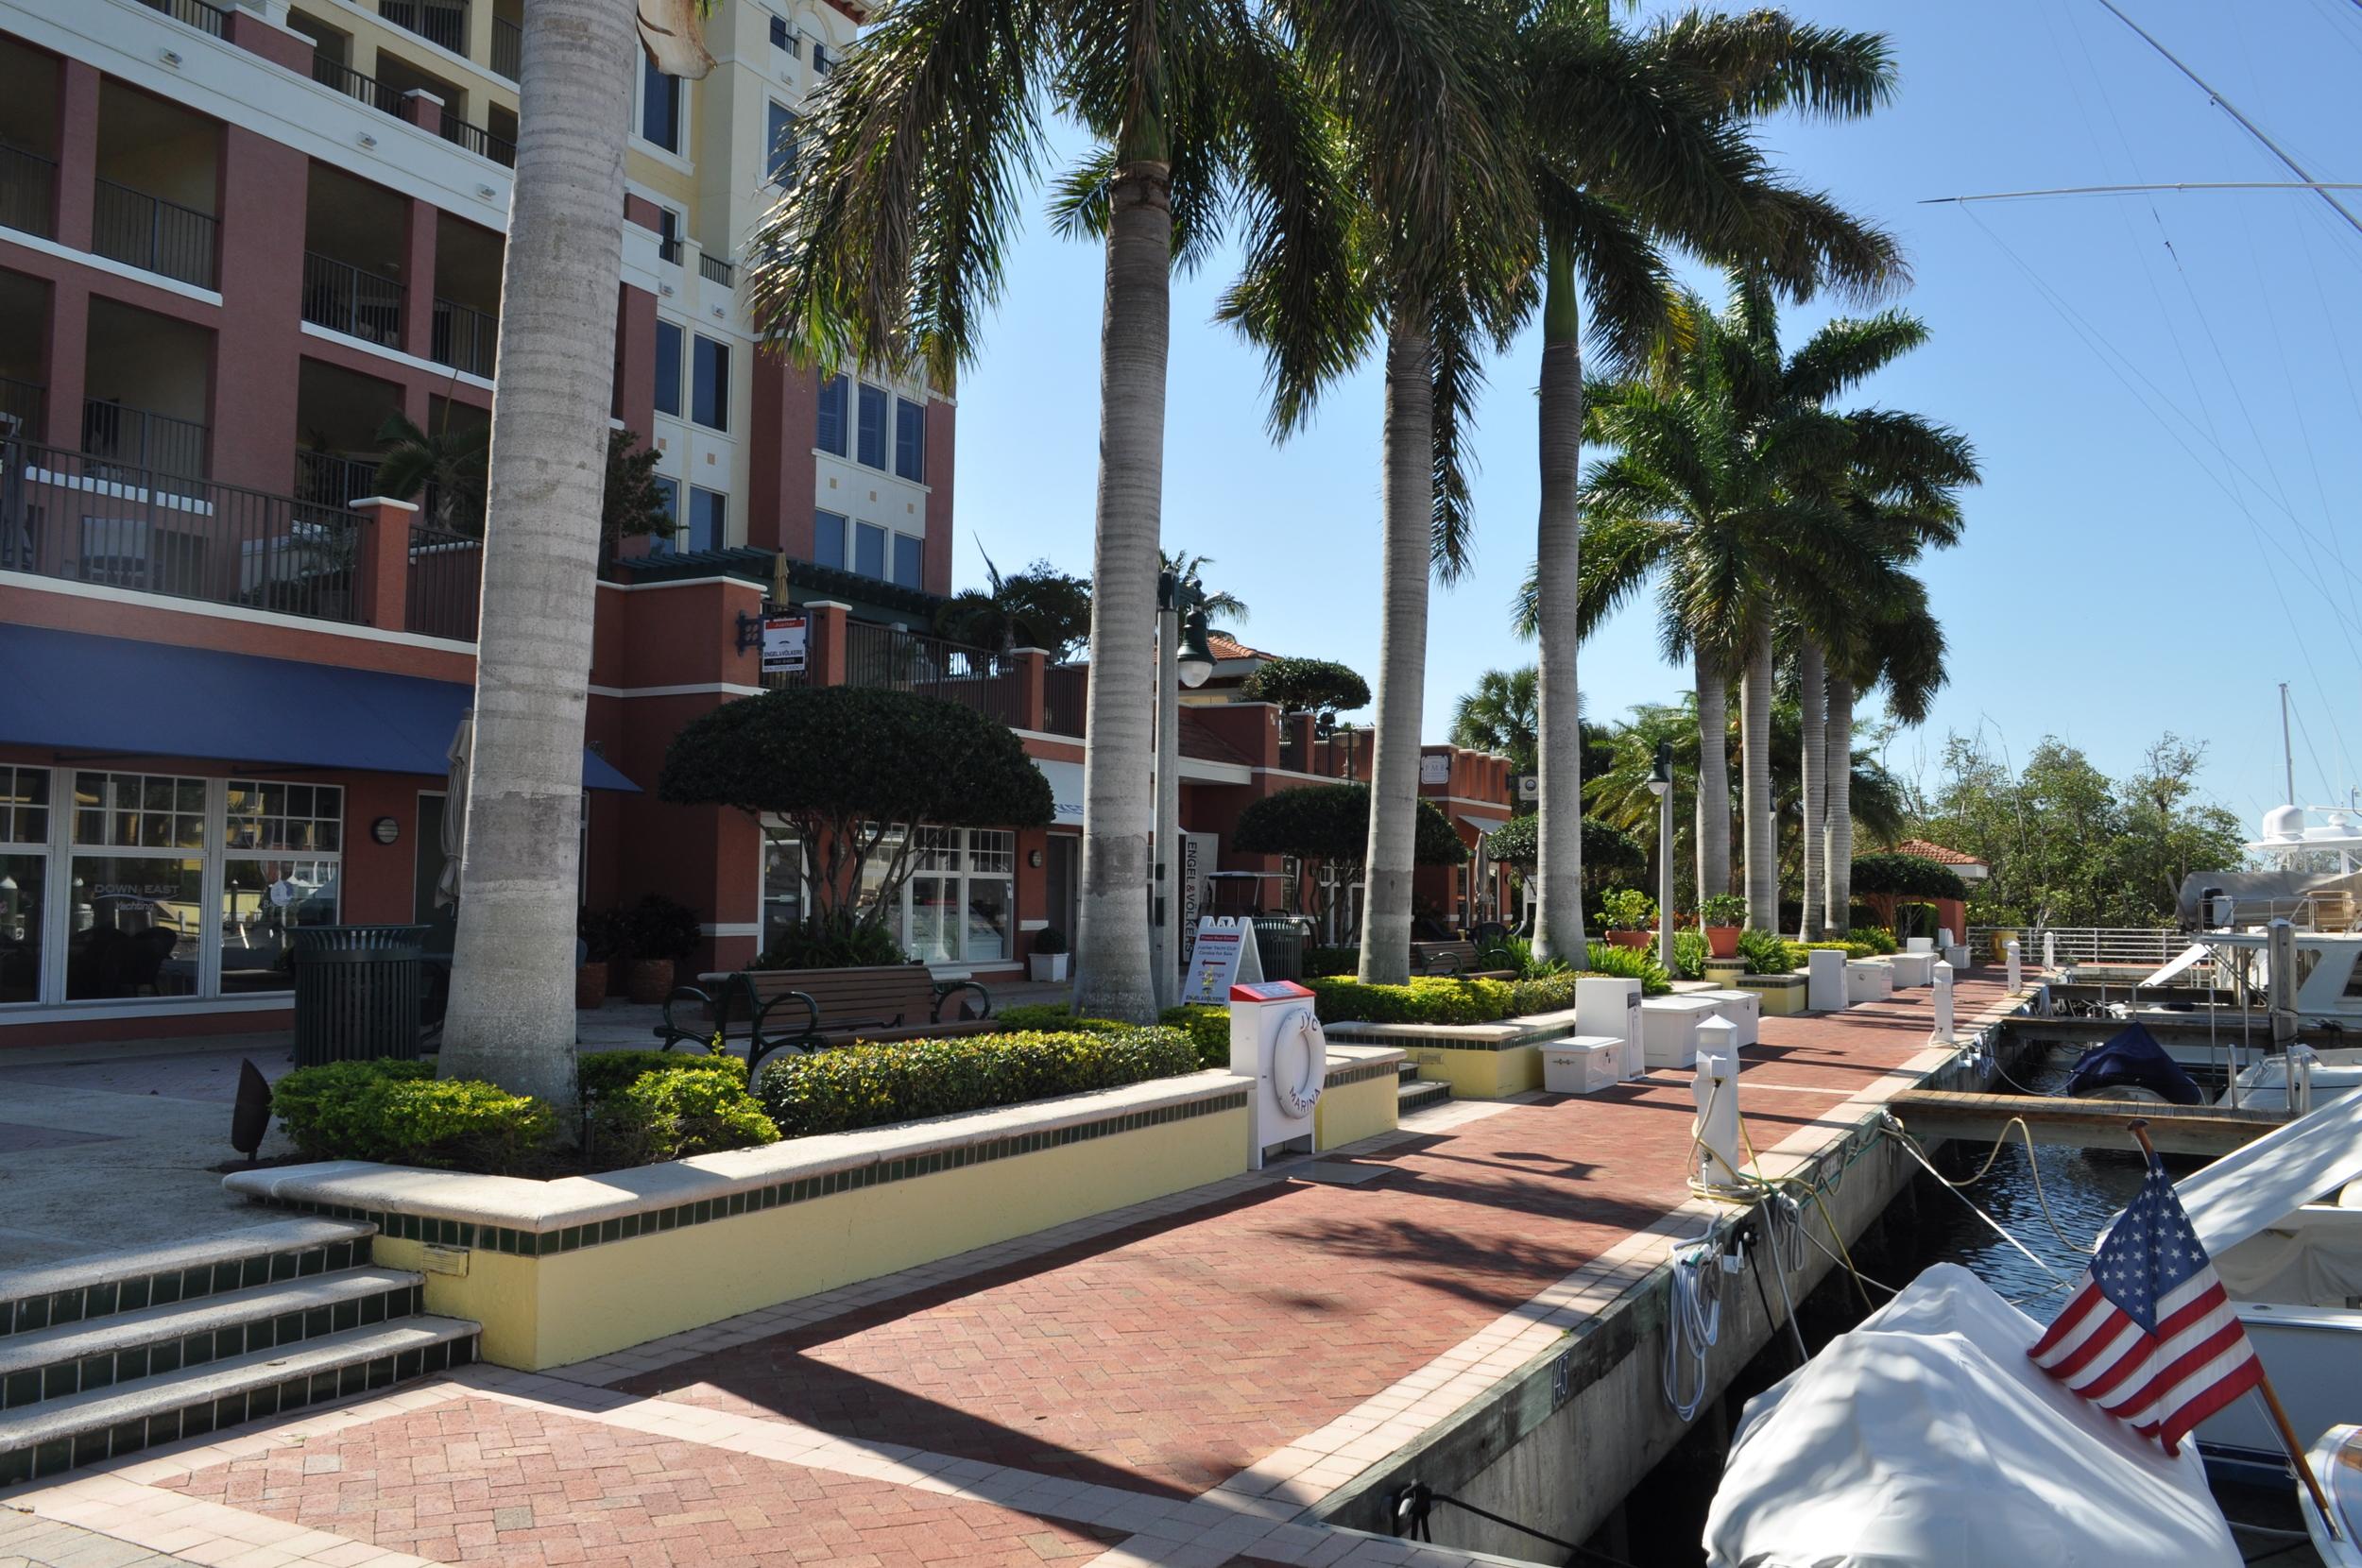 Jupiter Yacht Club Florida Riverwalk Marina and Retail Space.JPG